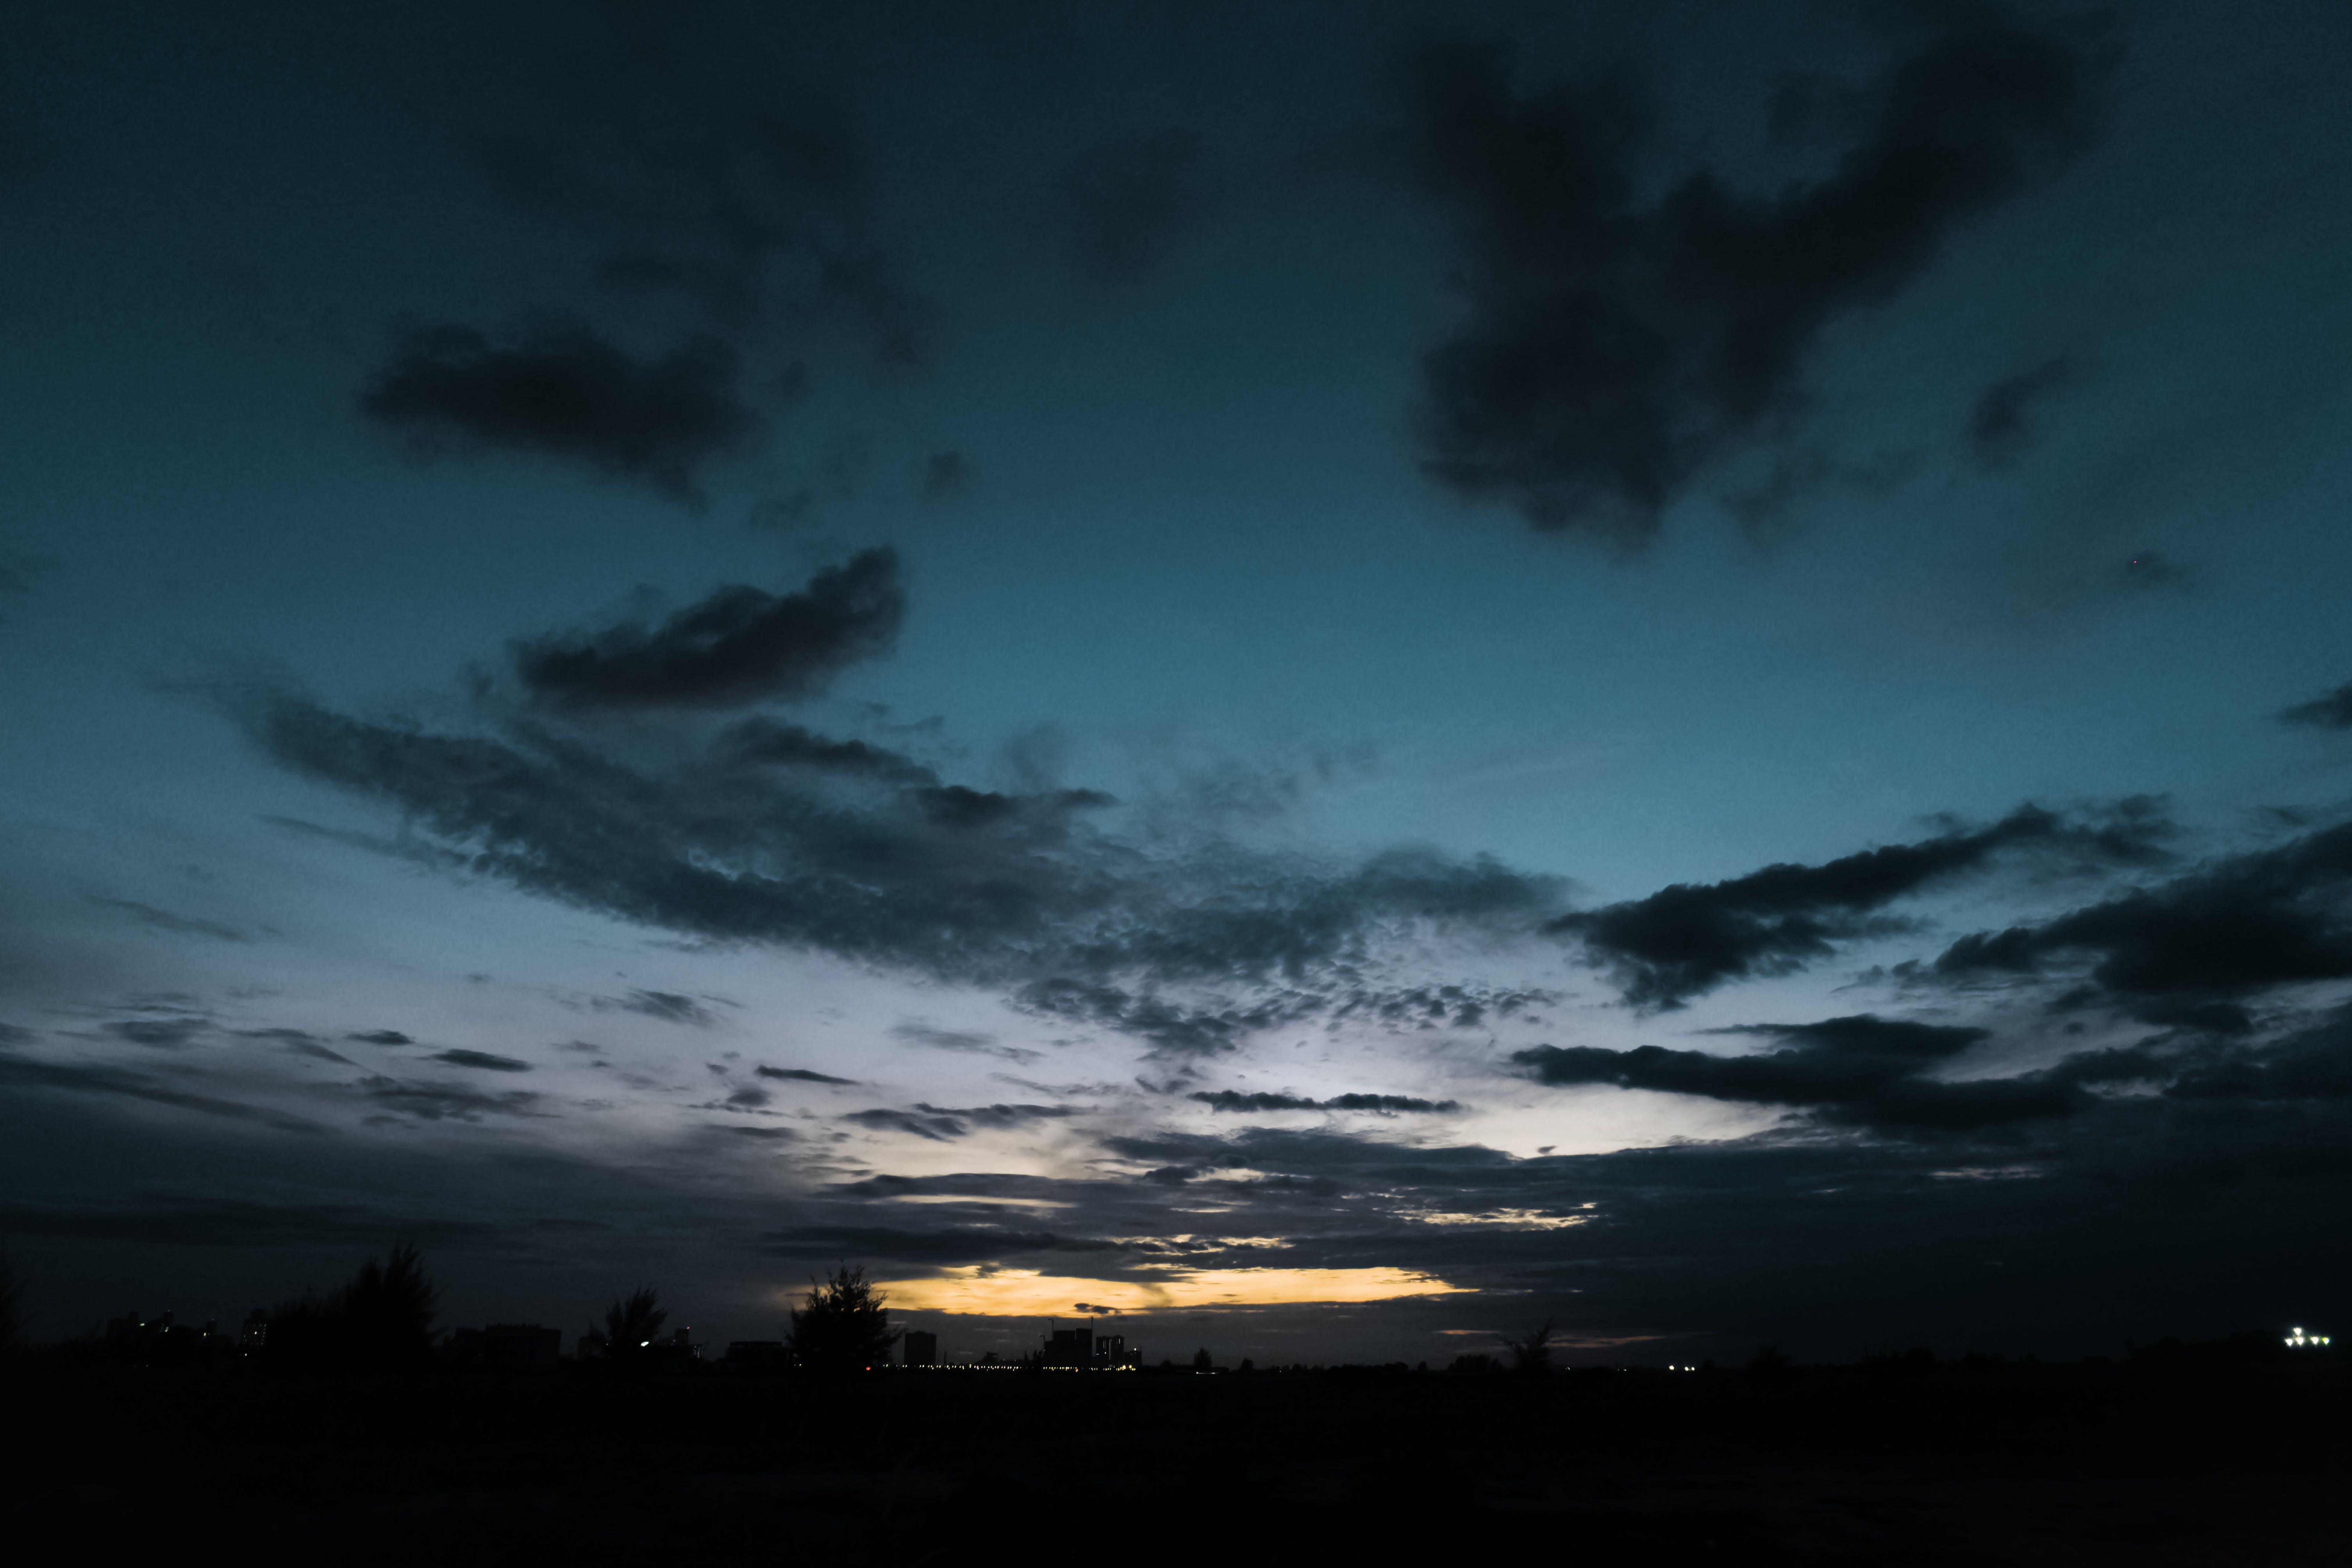 Kostenloses Stock Foto zu bäume, dämmerung, dramatisch, dunkel